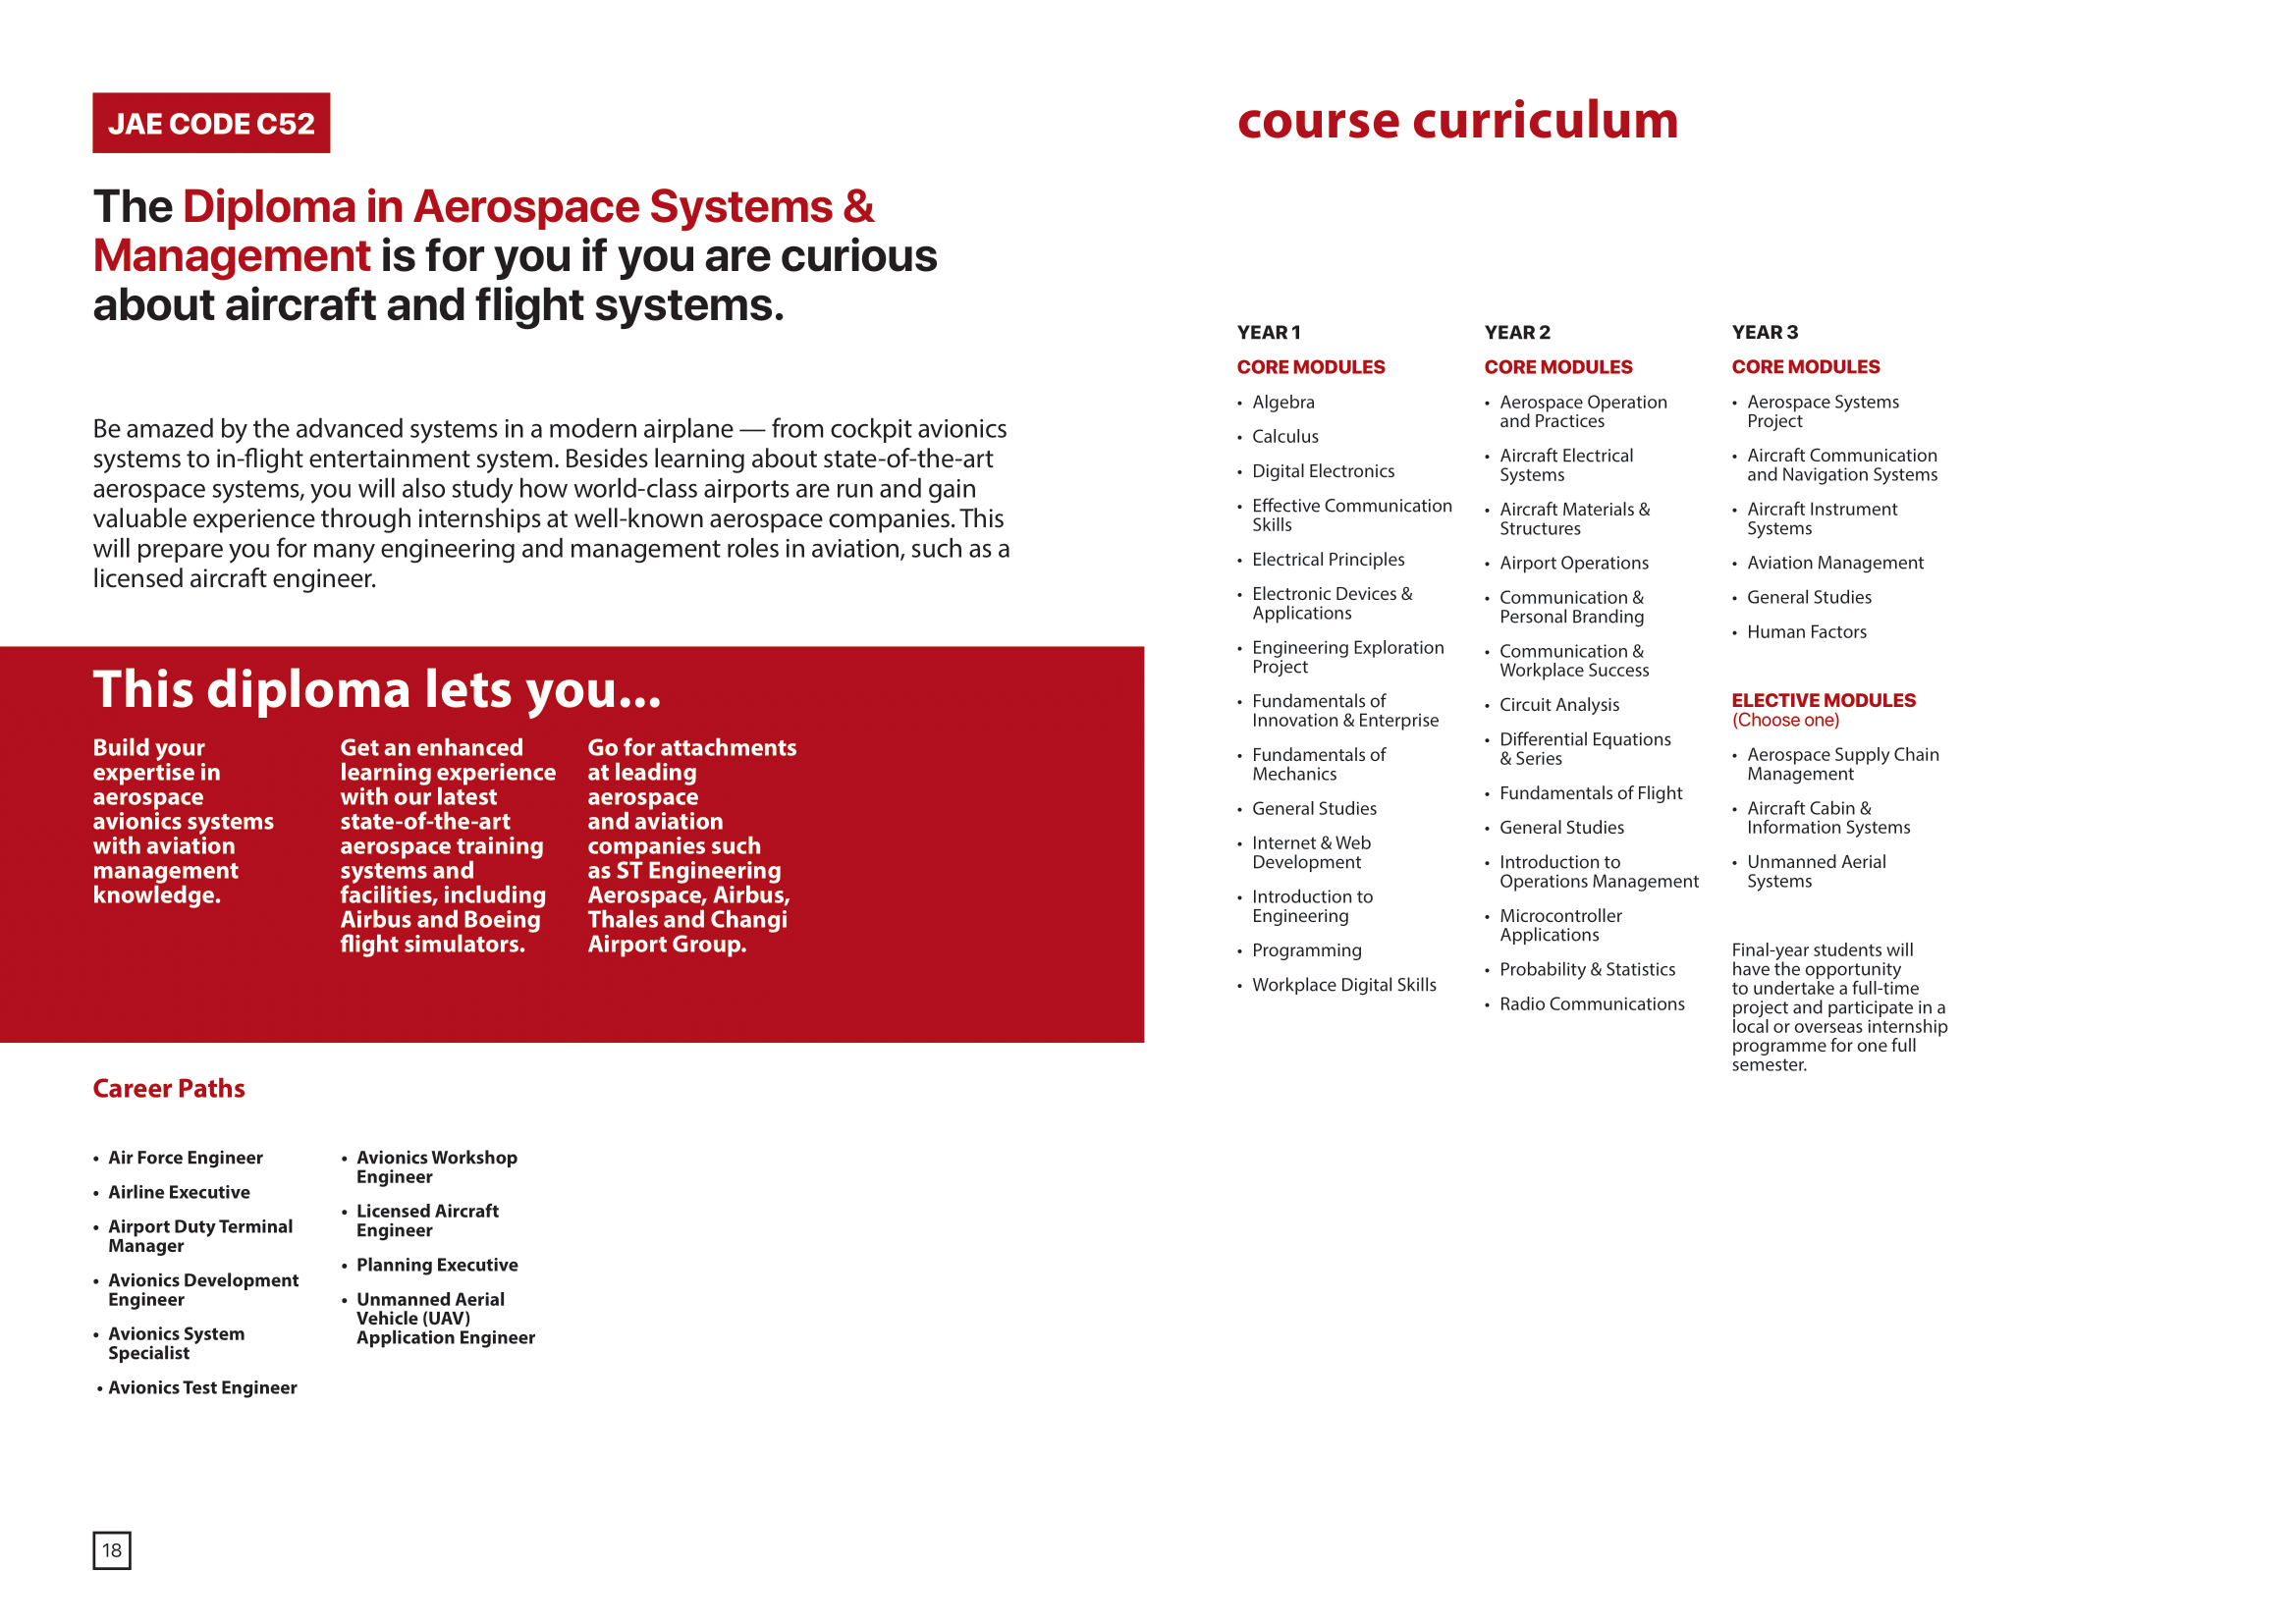 School of Engineering 2020-11